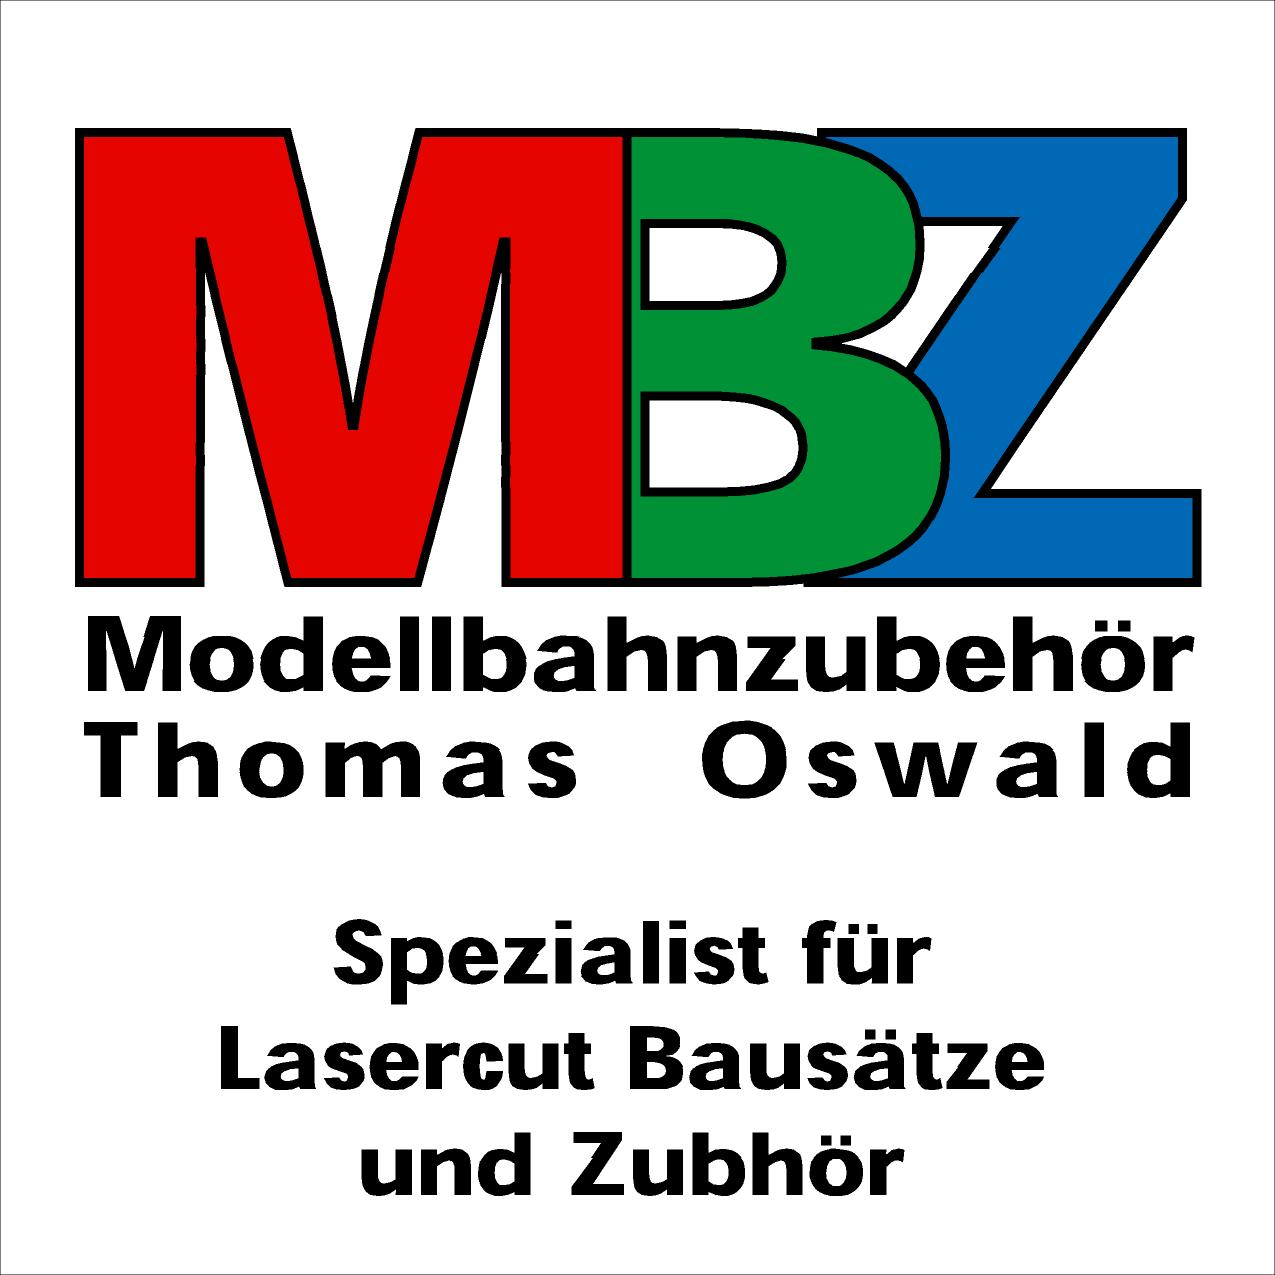 MBZ-Modellbahnzubehör